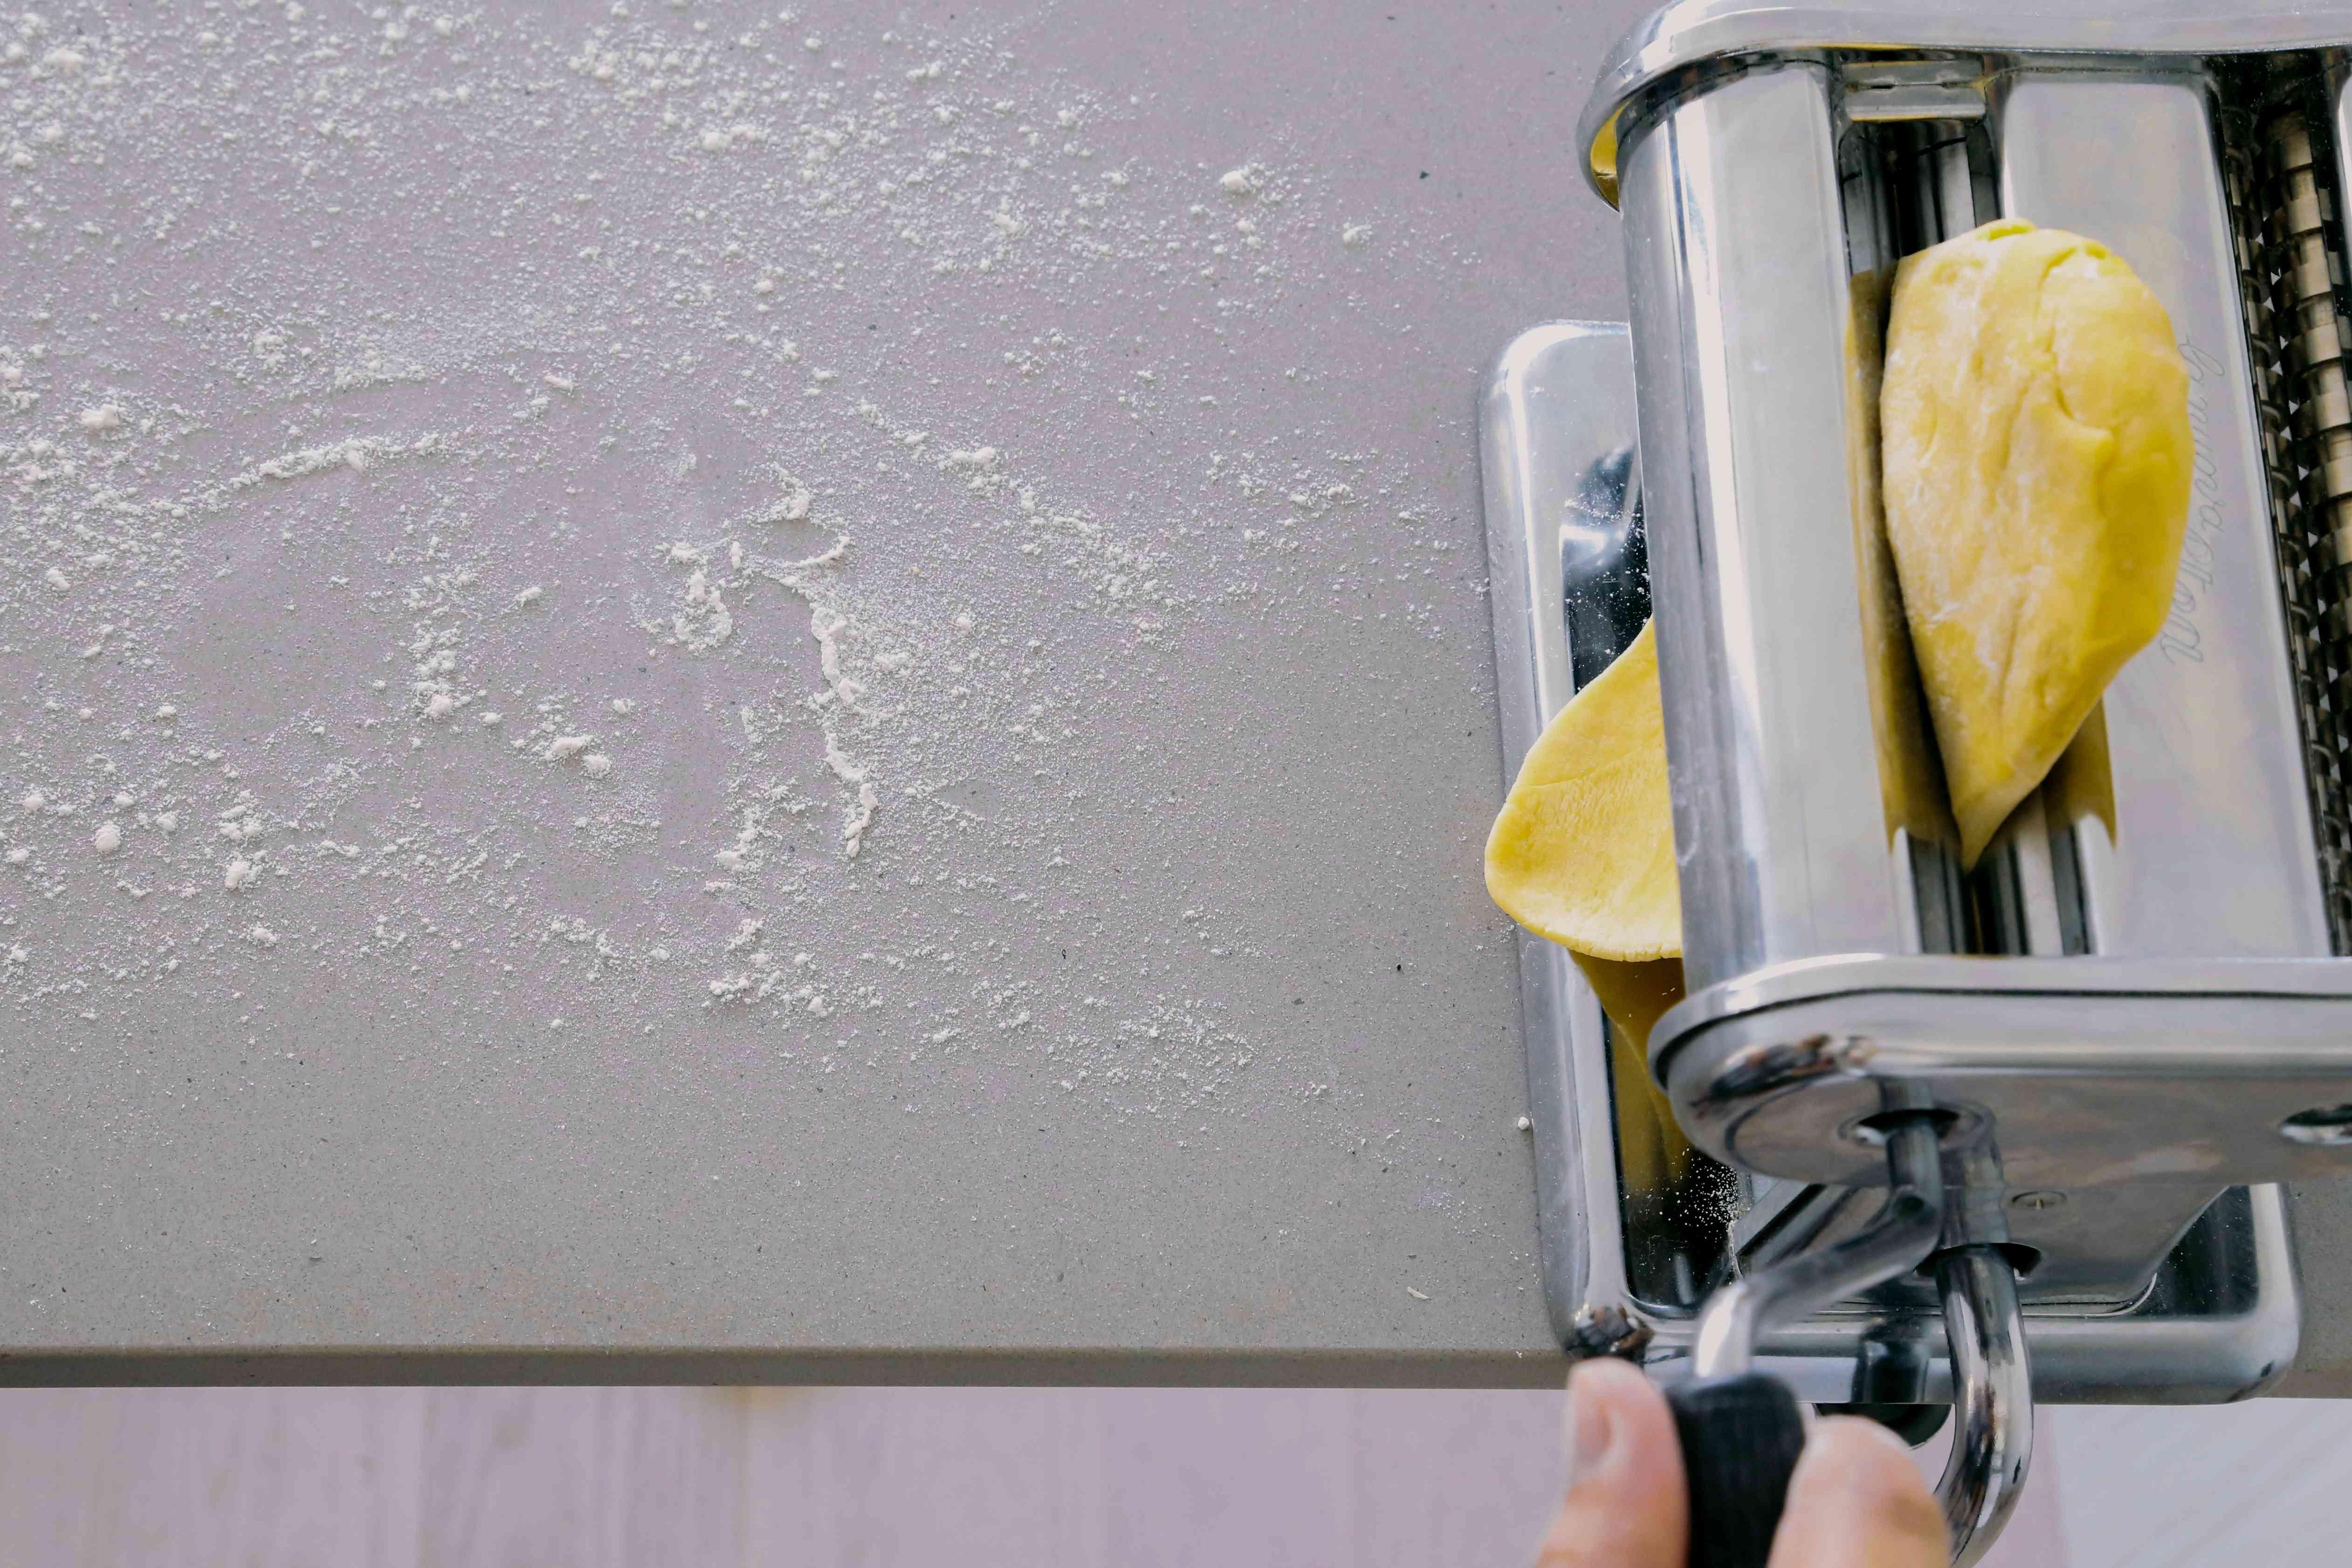 pasta dough in a pasta roller